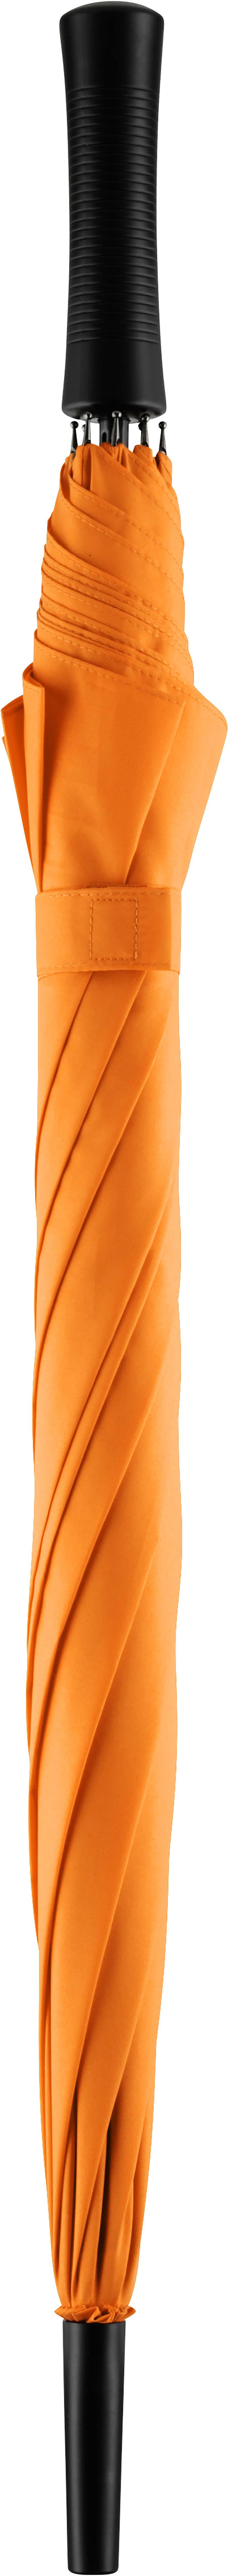 Parapluie standard - 20-1384-34